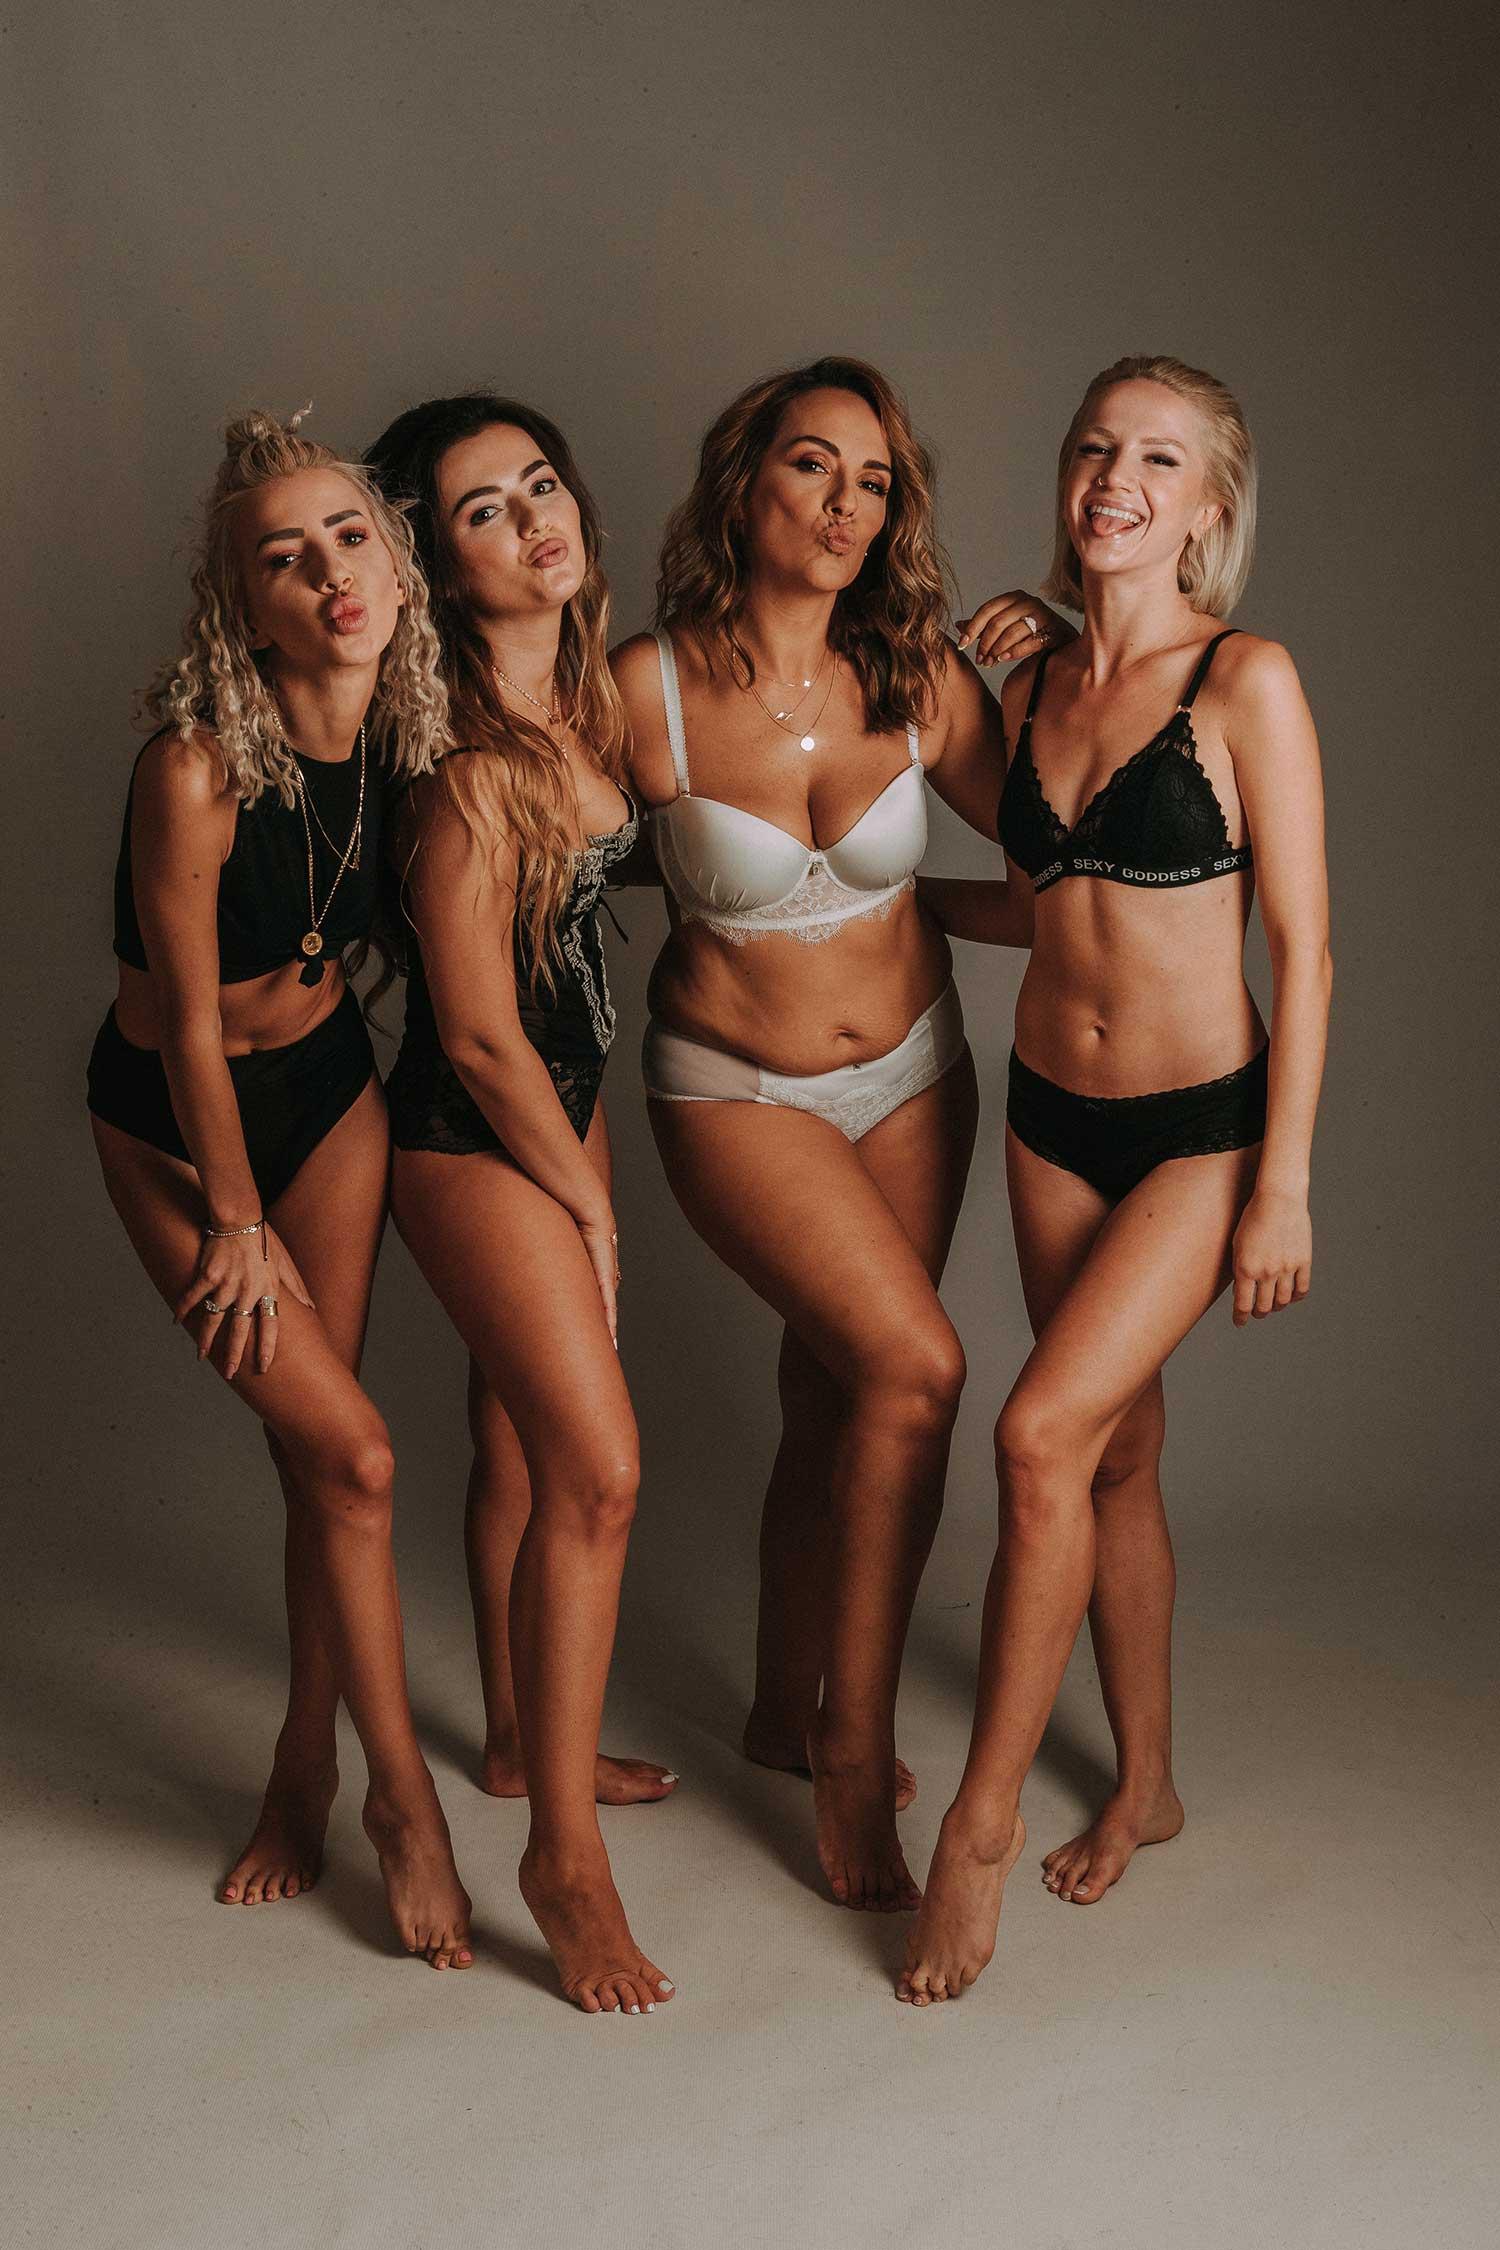 Girls loving their body